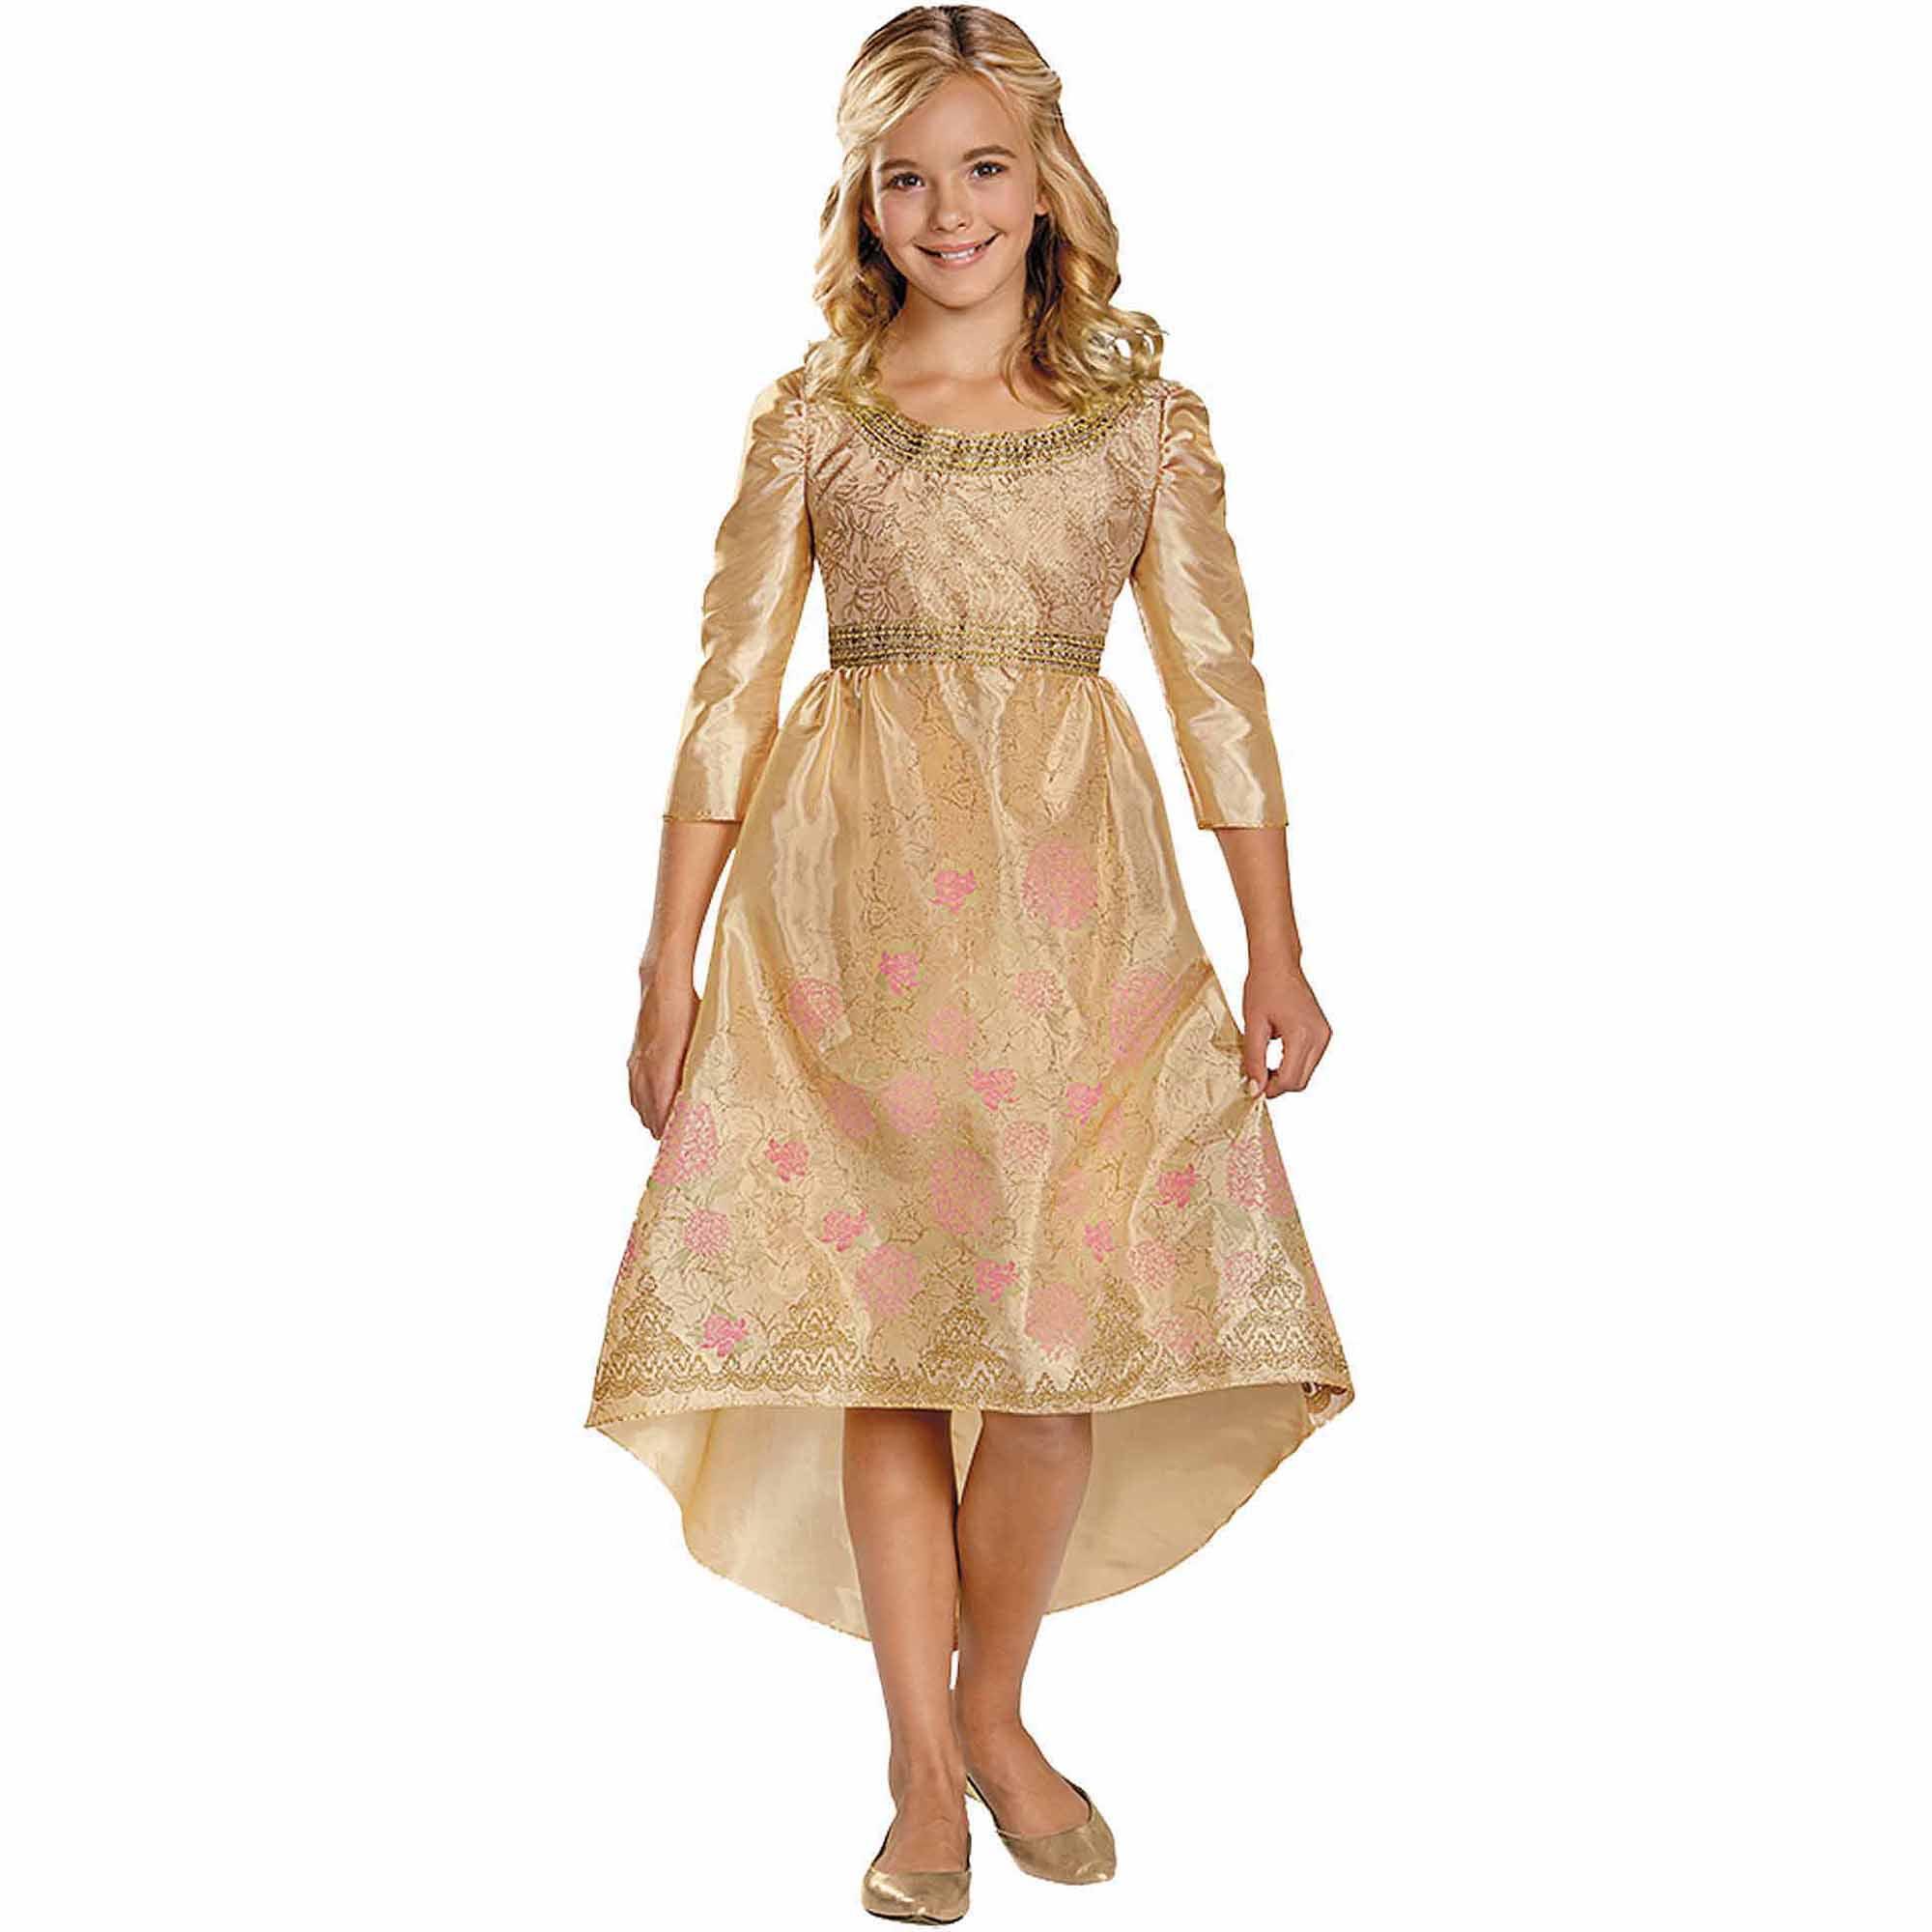 Aurora Coronation Gown Child Halloween Costume